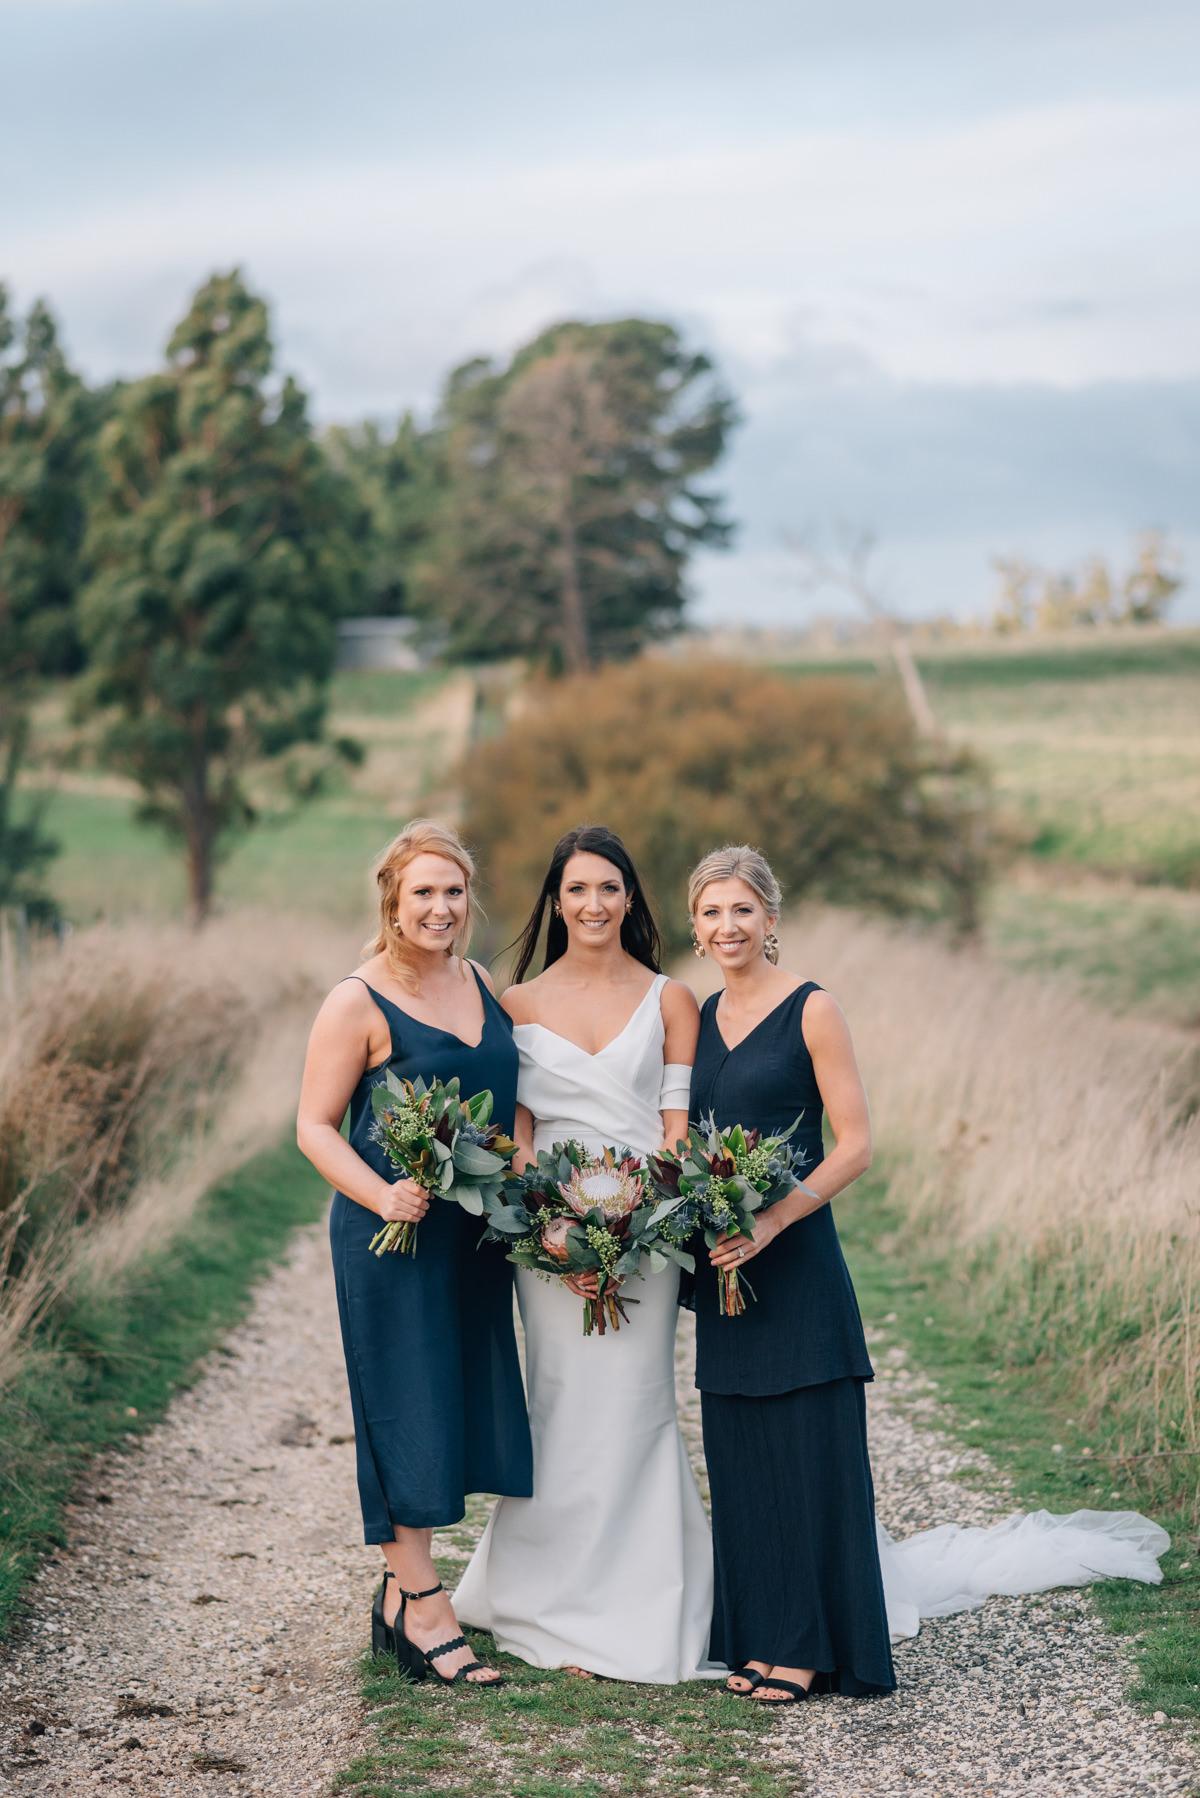 Wedding-Photohraphy-Launceston-Wines-For-Joanie-45.jpg